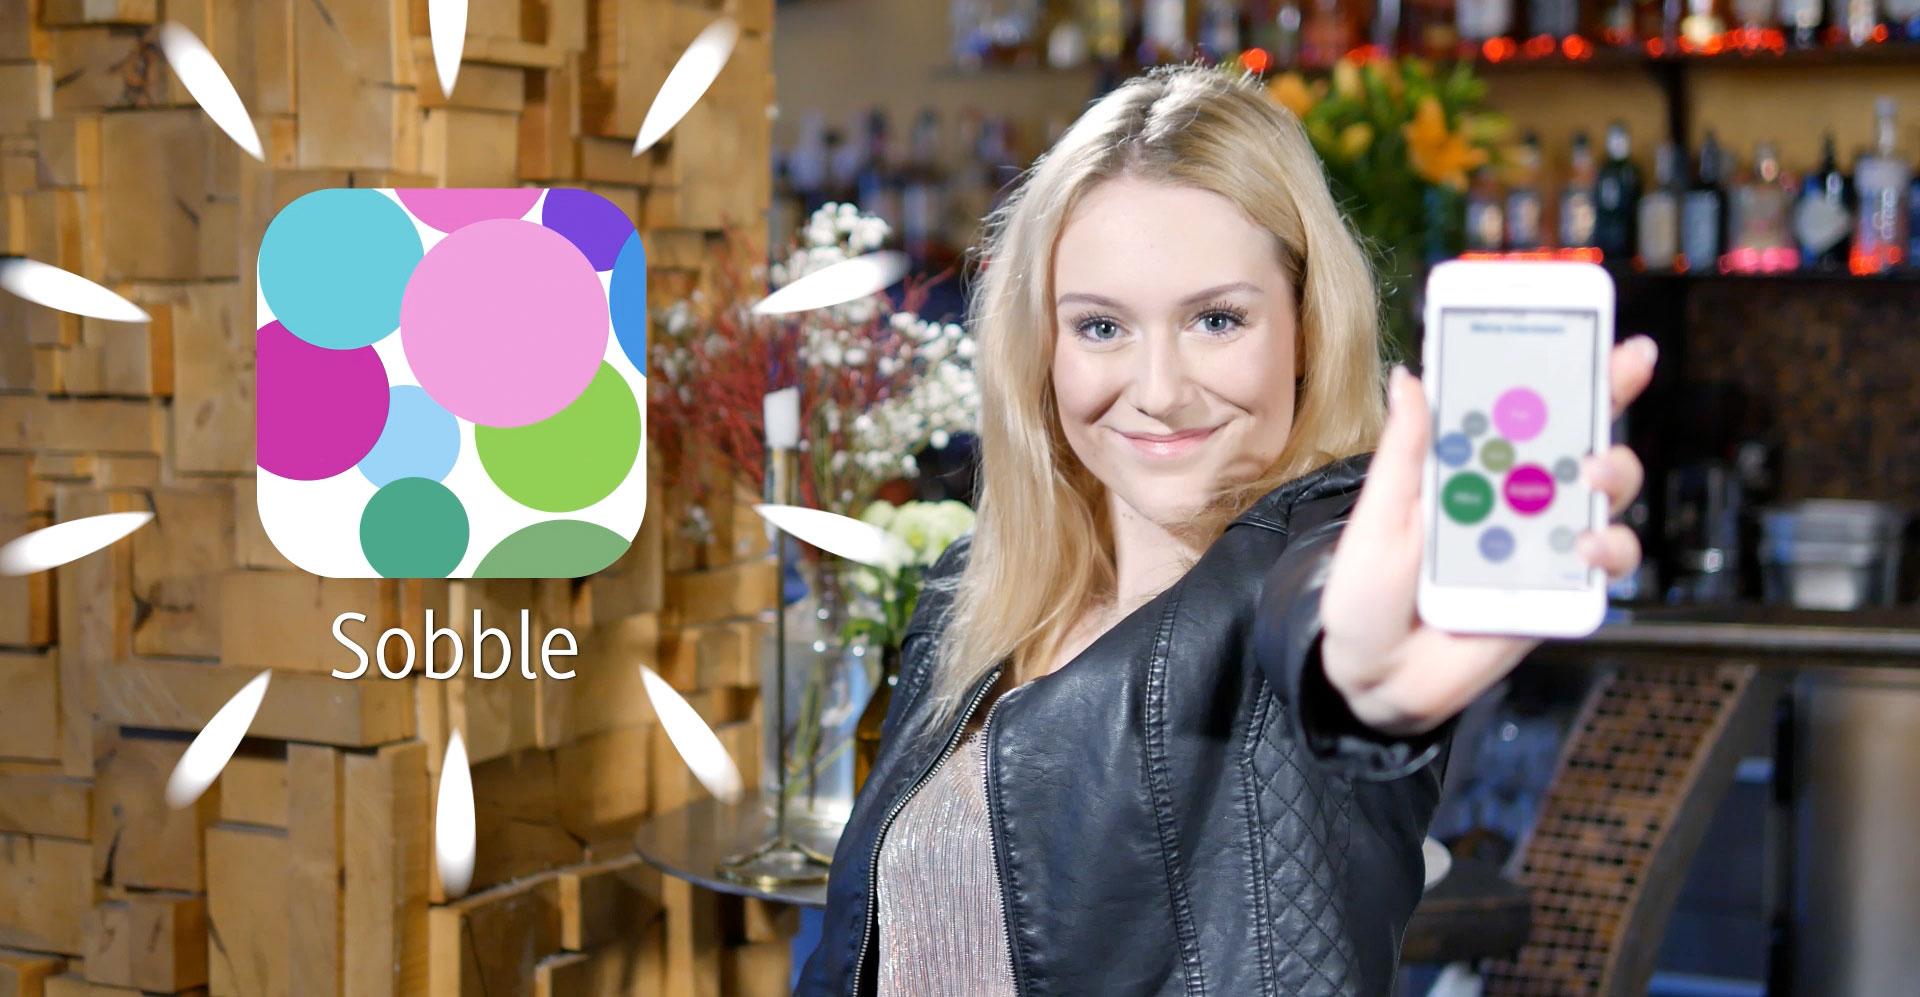 Sobble App